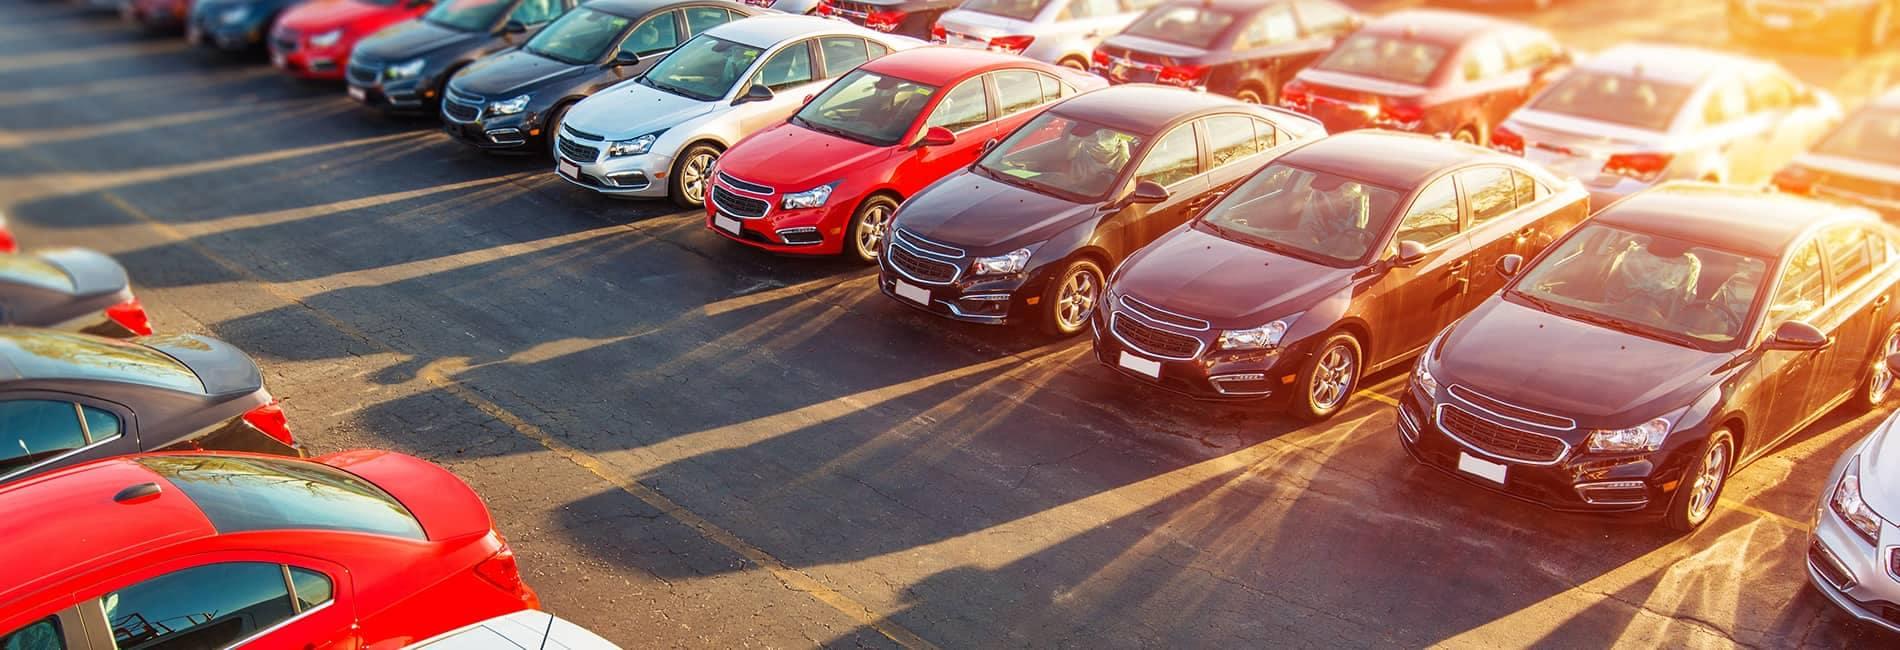 Used-Car-Sales-Lot